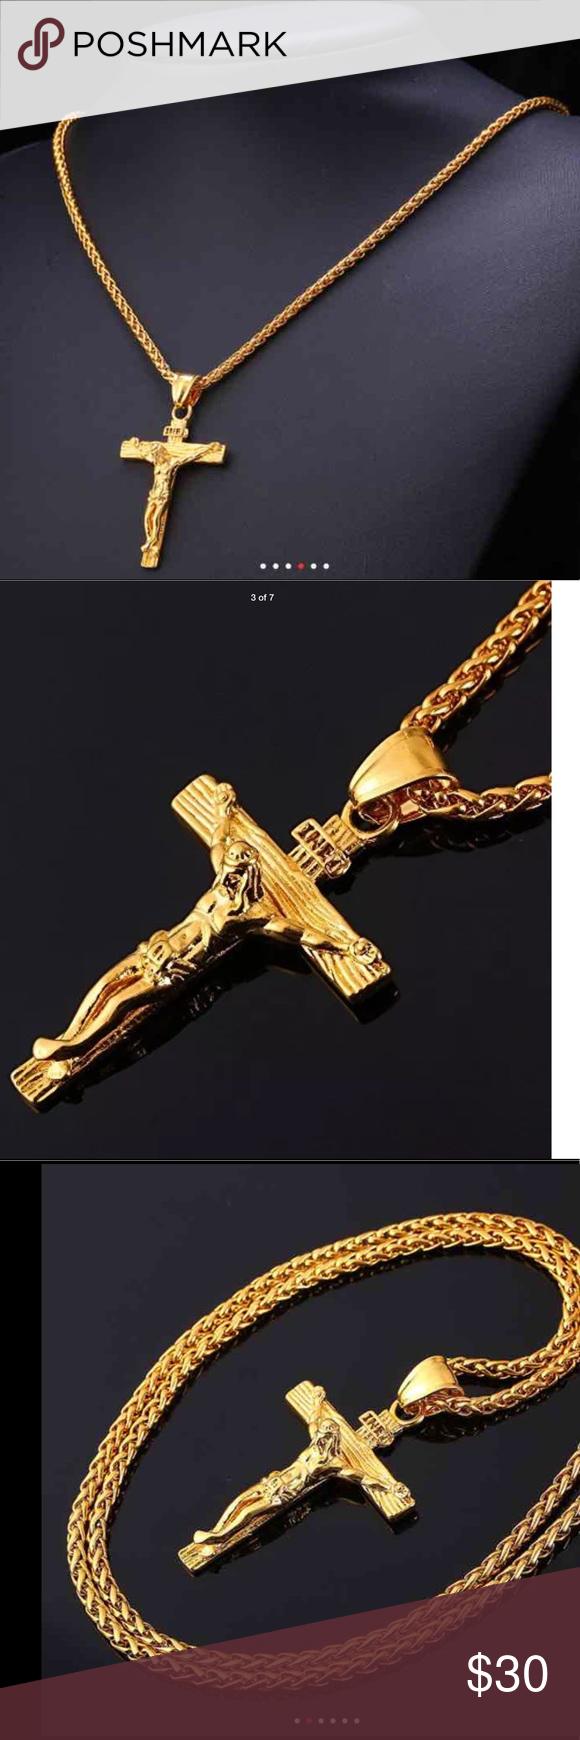 New 18k gold cross necklace for men nwt new 18k gold cross necklace for men new 18kyellow gold filled inri jesus piece cross pendant aloadofball Images